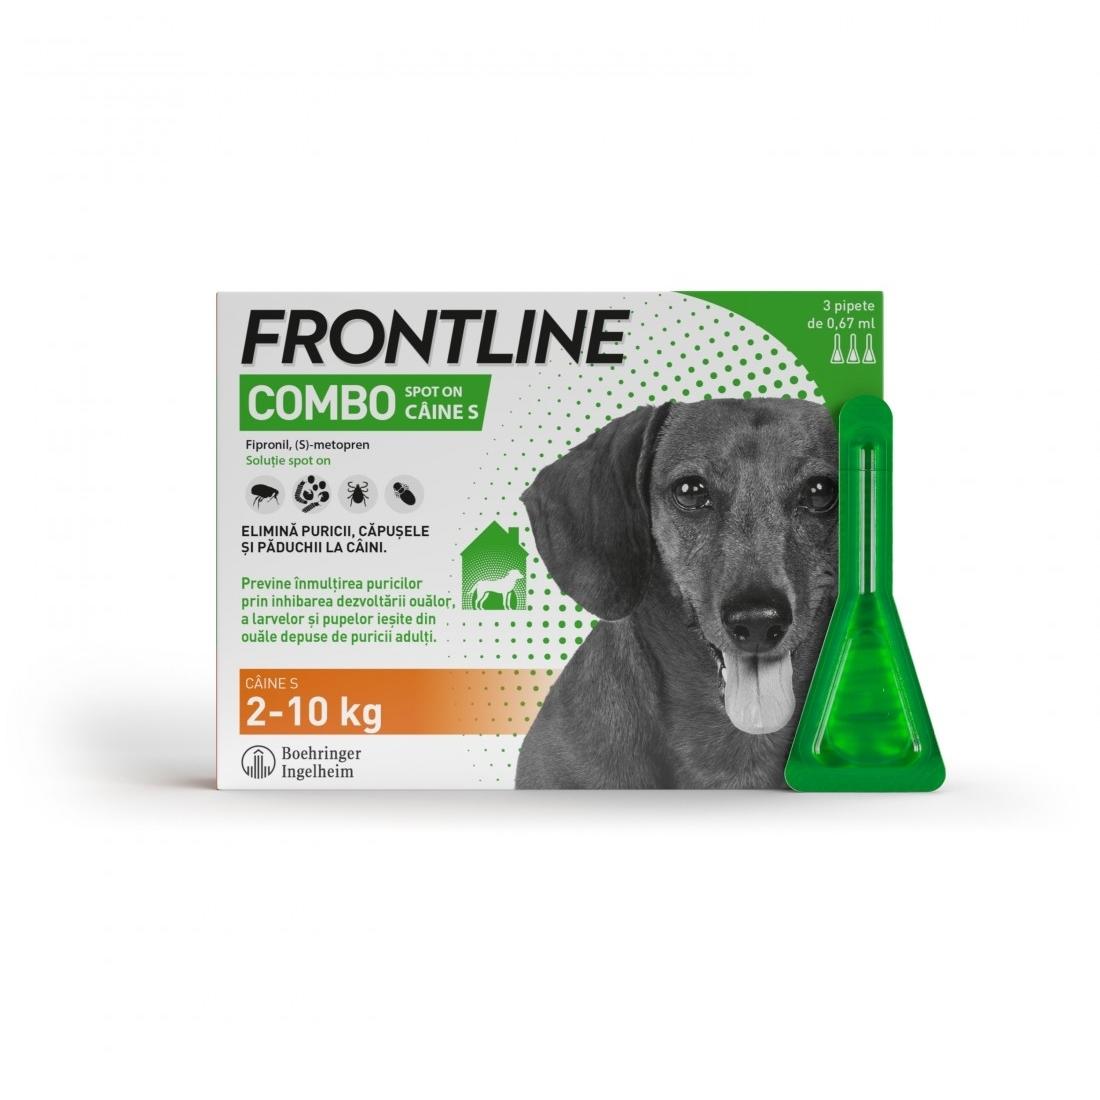 Frontline Spot On Caine S (2-10 kg) - 3 Pipete Antiparazitare imagine